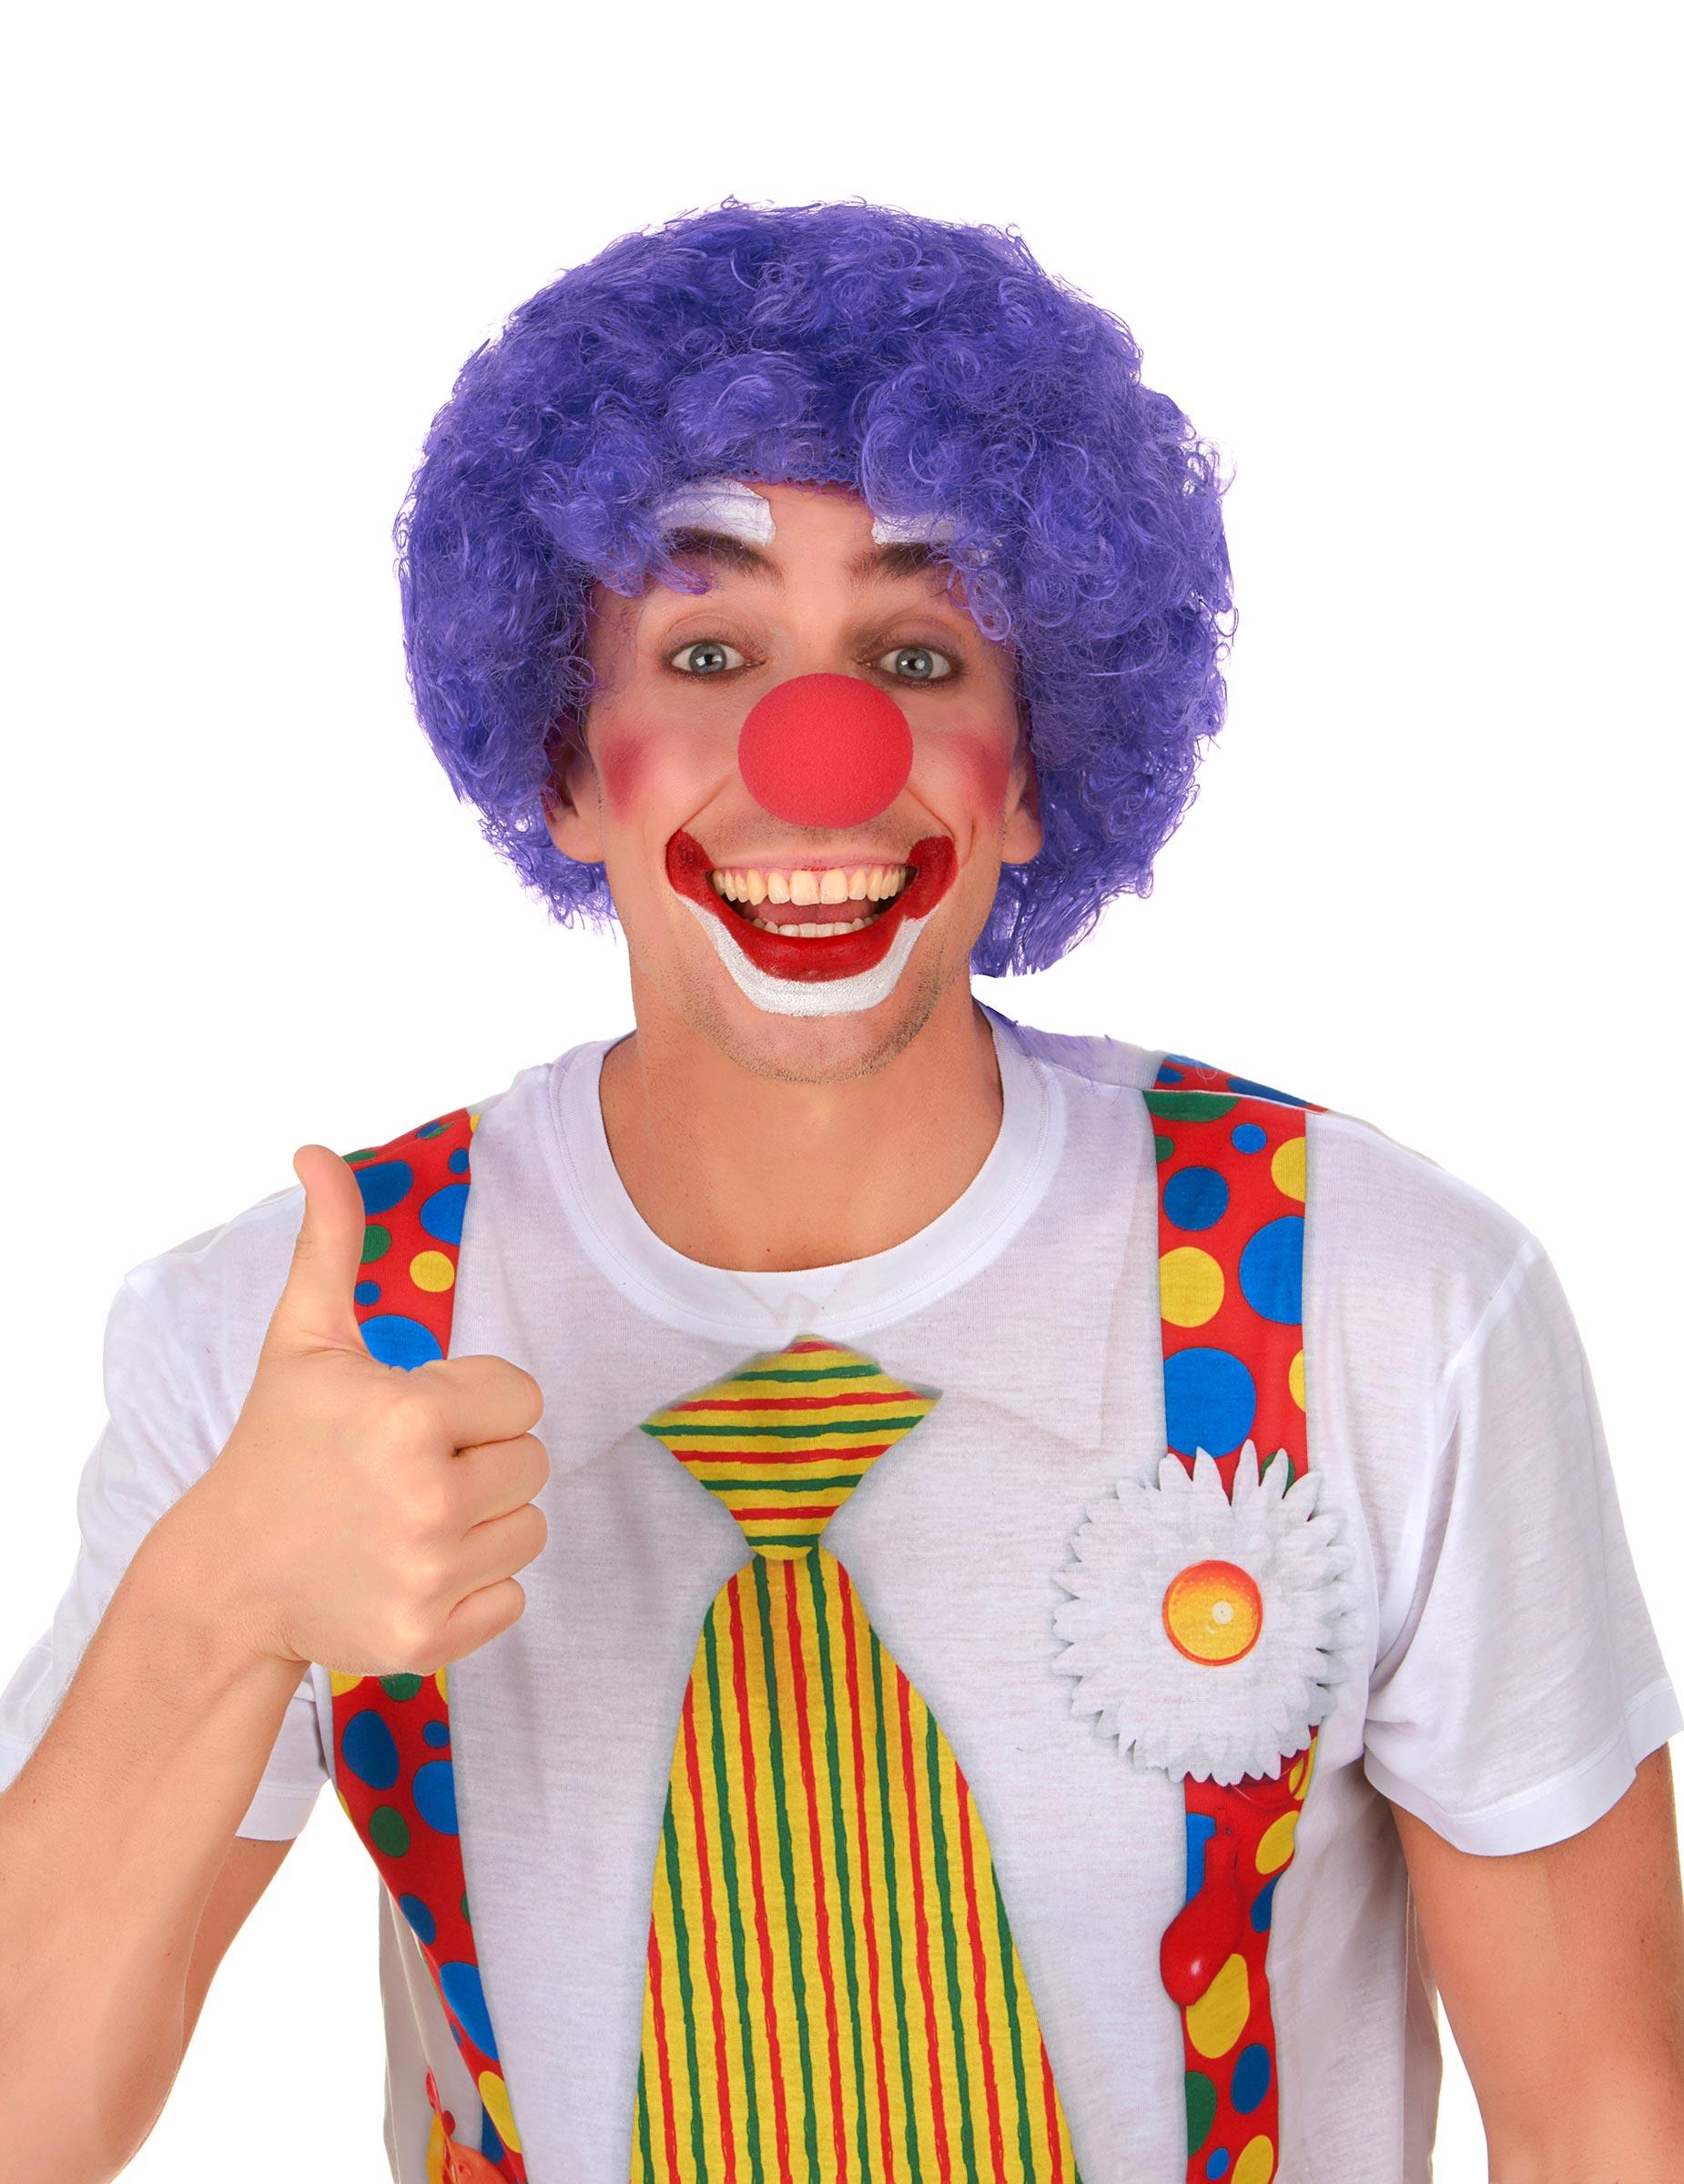 lustige clown afro per cke lila g nstige faschings accessoires zubeh r bei karneval megastore. Black Bedroom Furniture Sets. Home Design Ideas